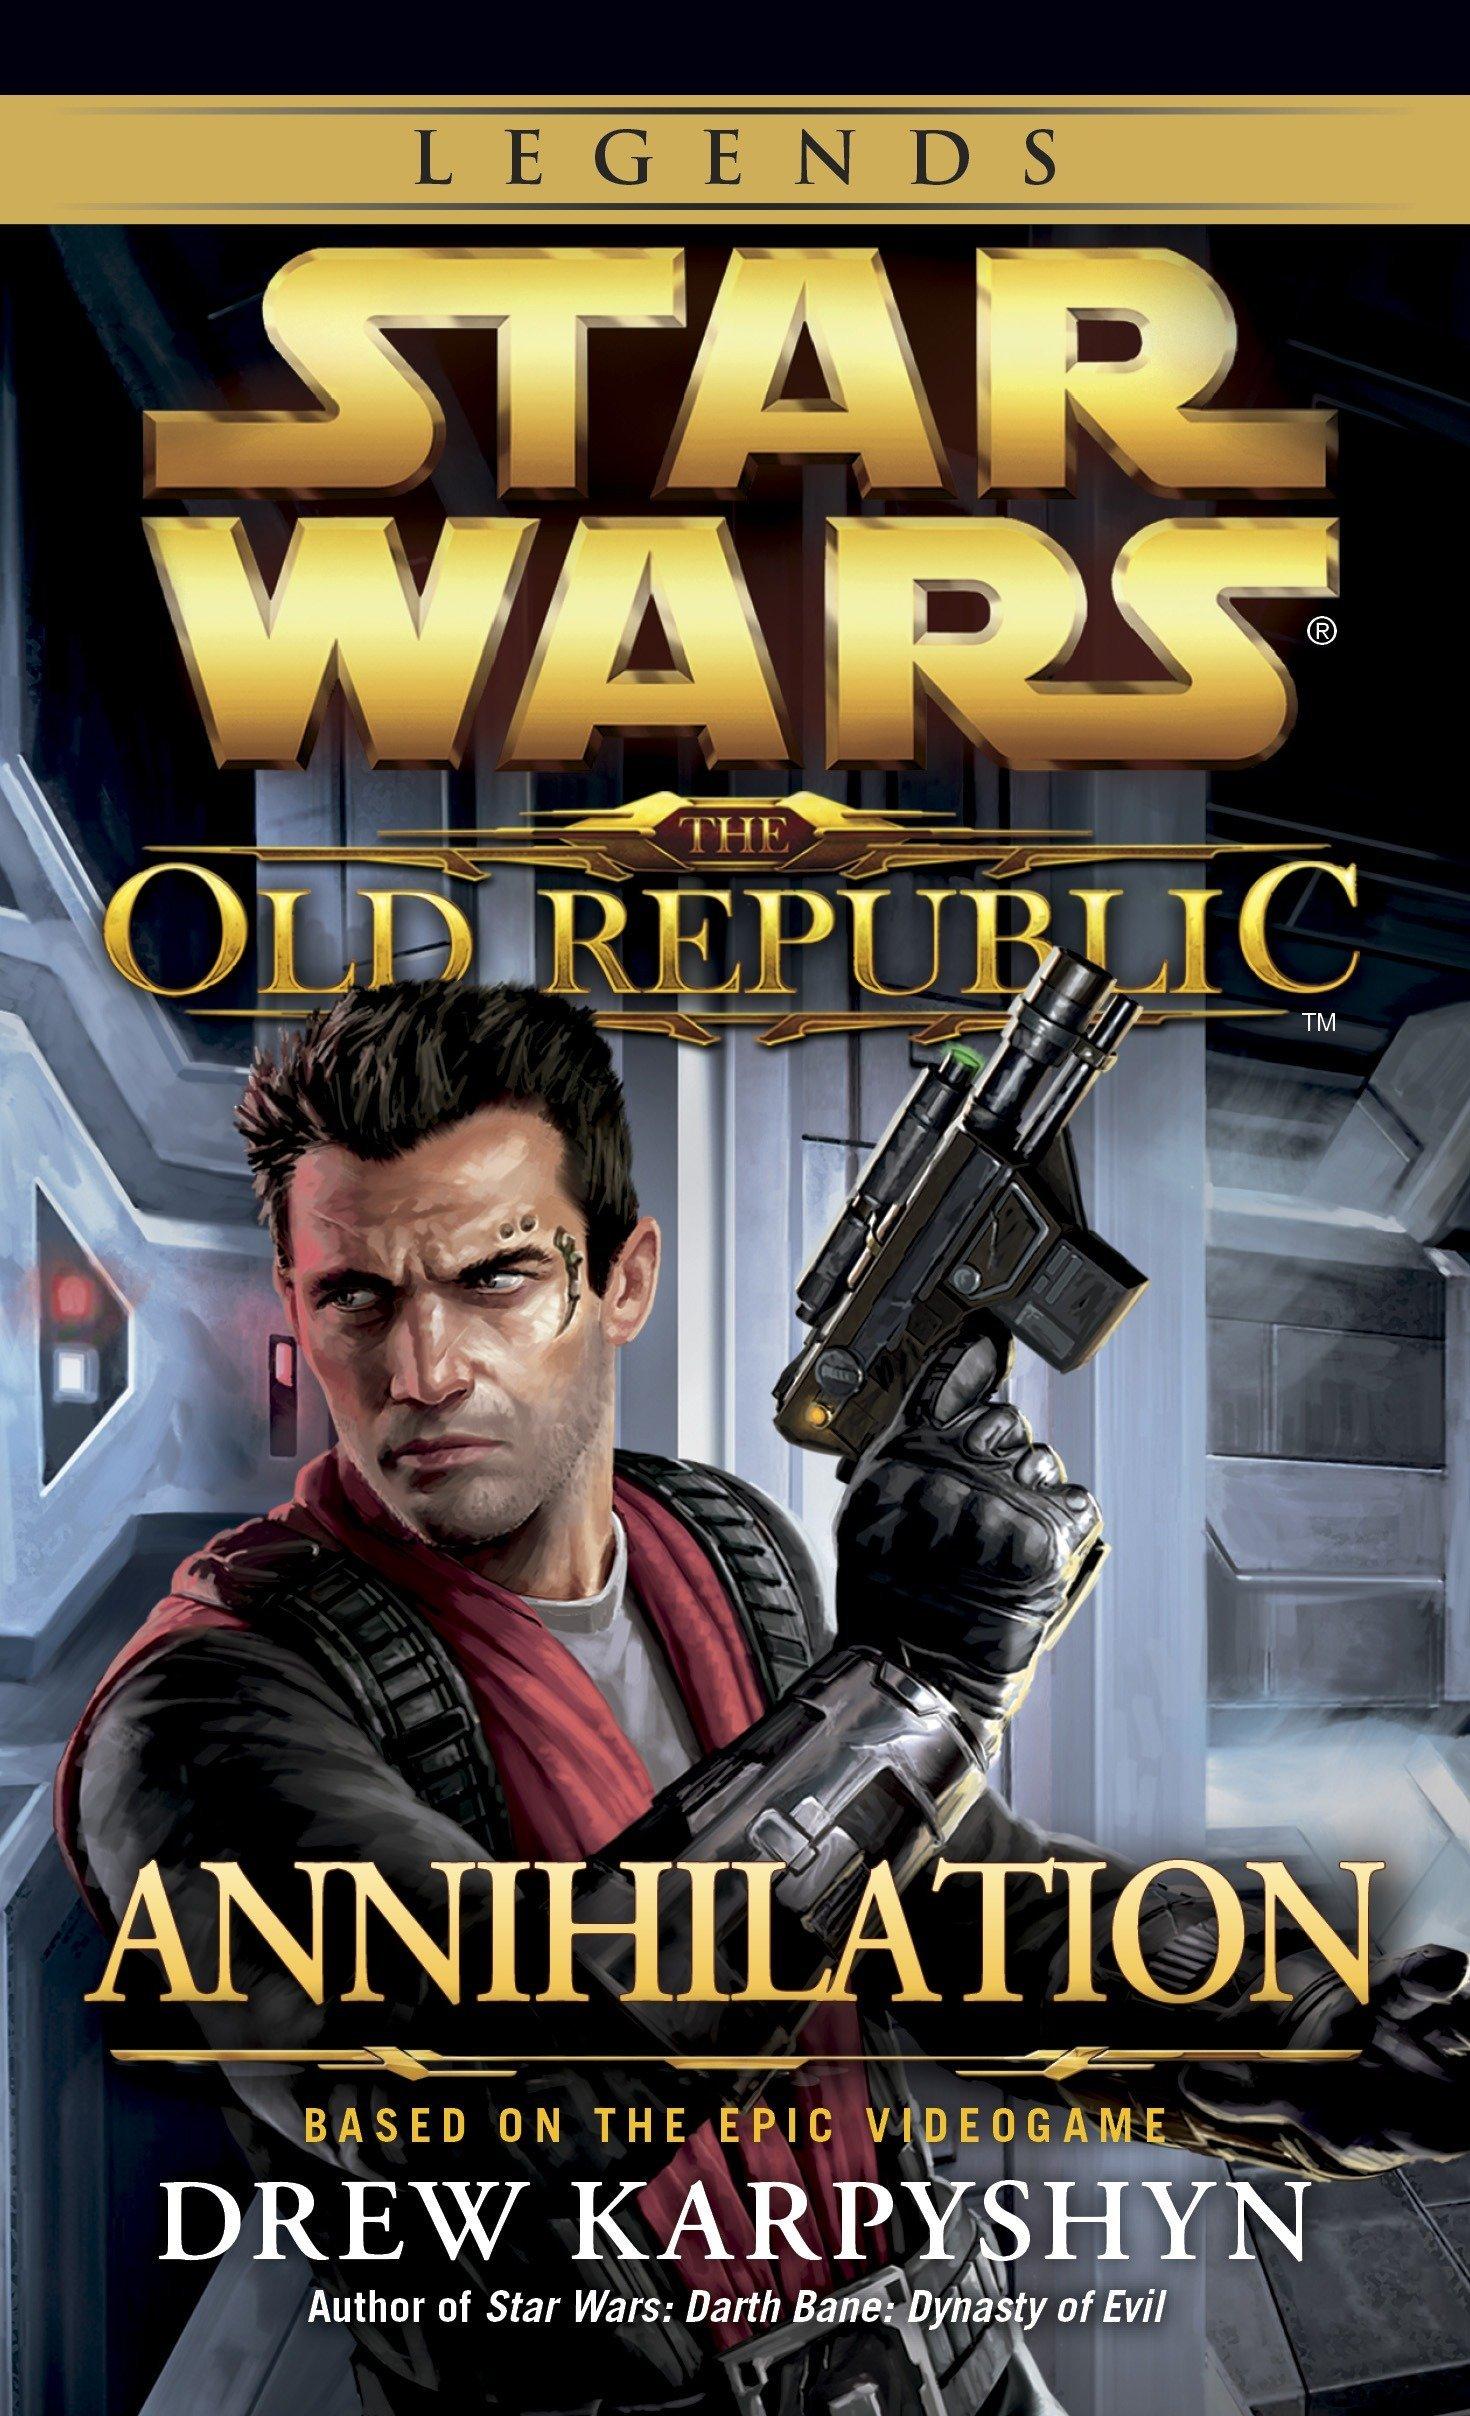 Annihilation: Star Wars Legends (The Old Republic) (Star Wars: The Old Republic - Legends, Band 4)